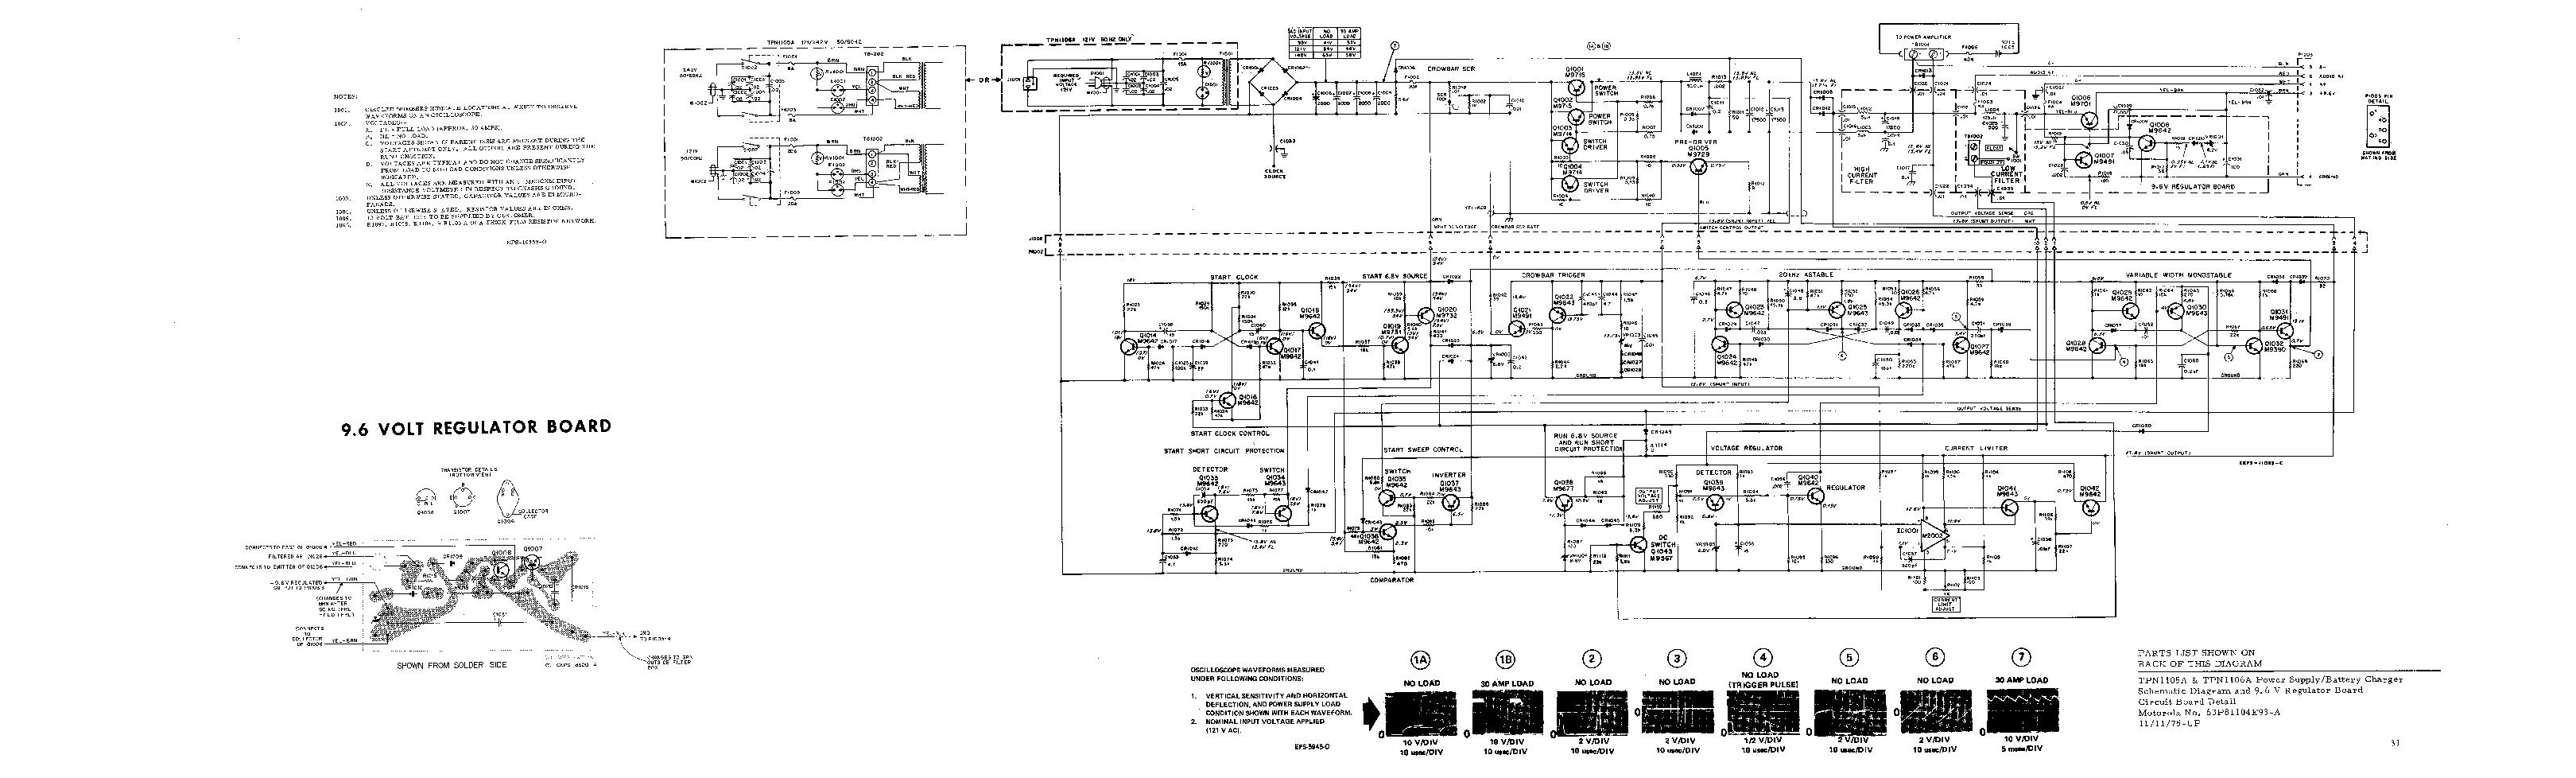 Motorola Gm350 Service Manual Free Download  Schematics